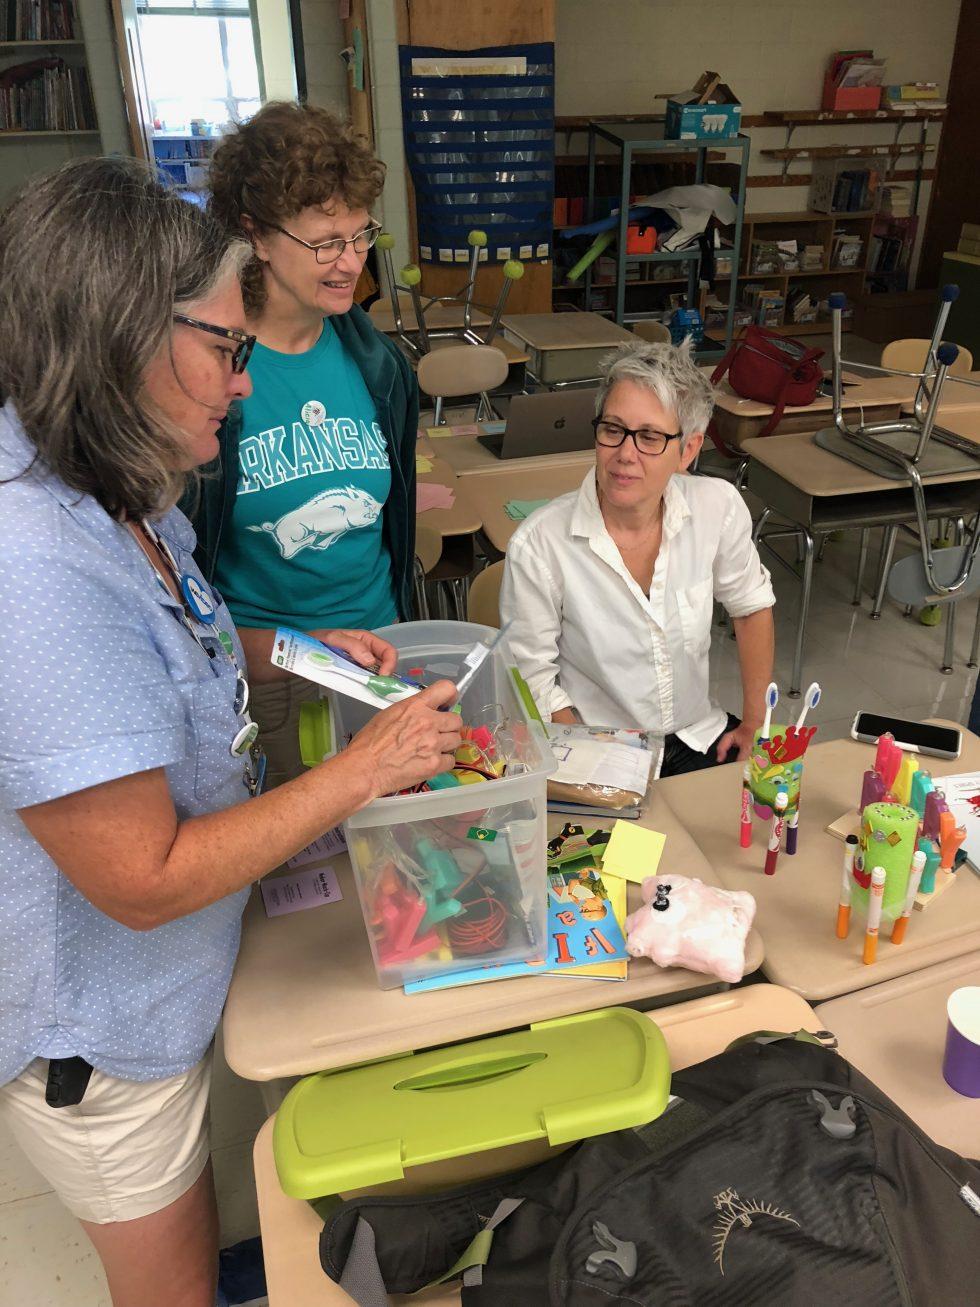 Teachers Taking Time for Tech